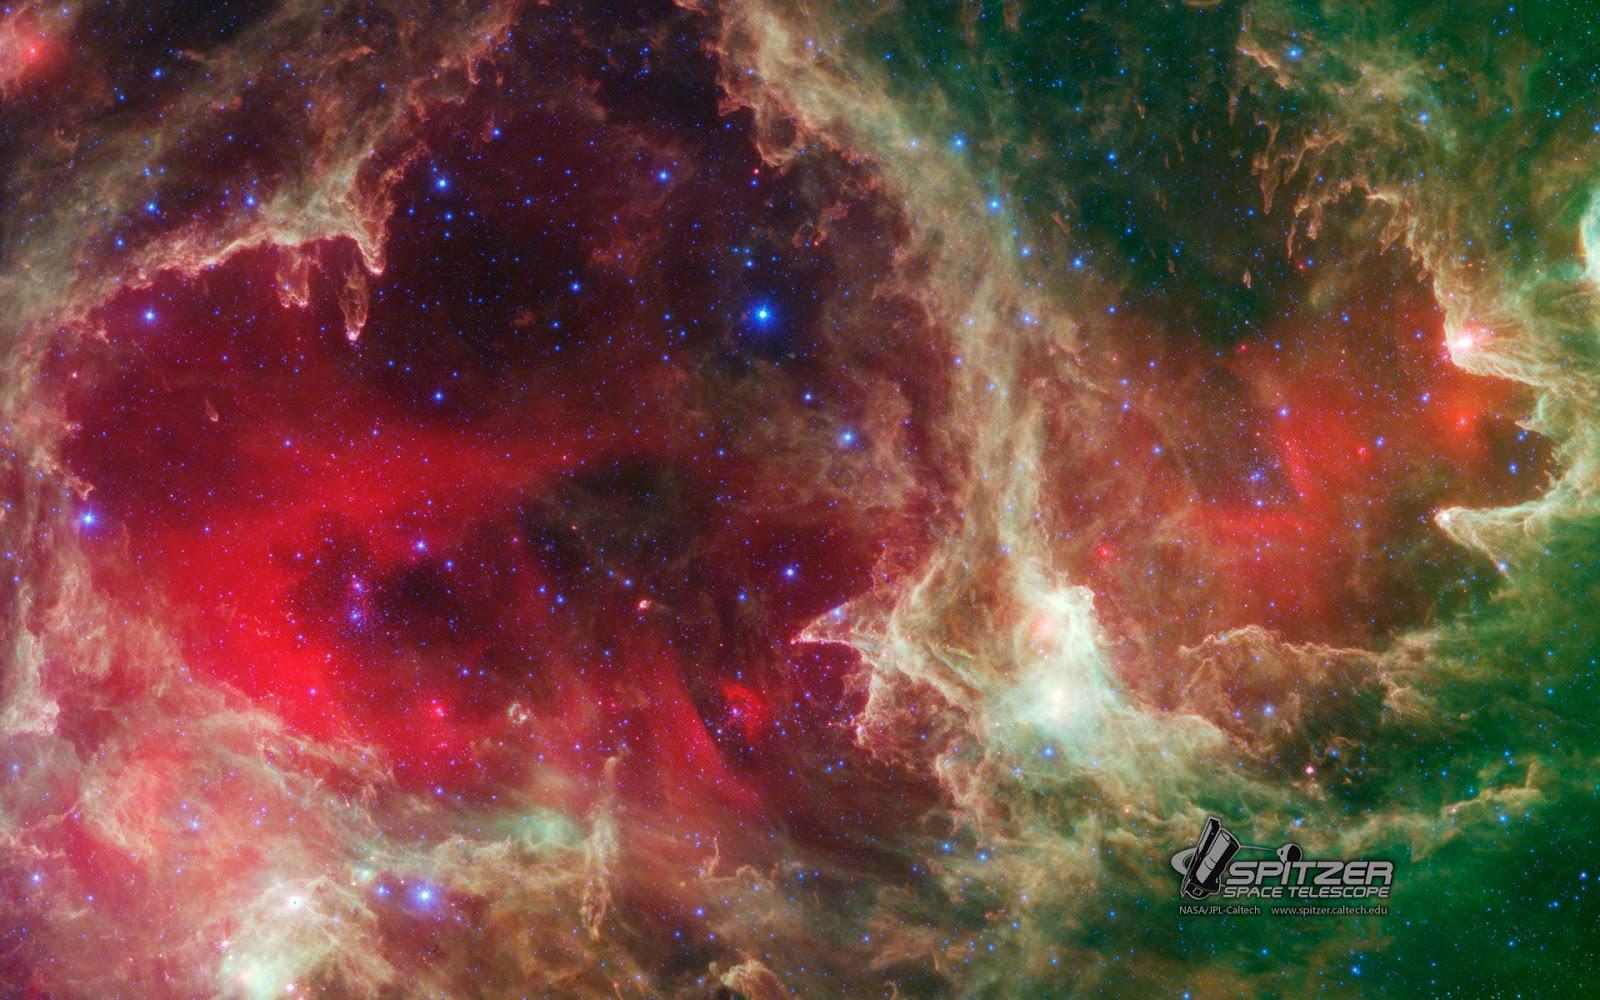 spitzer nebula - photo #17